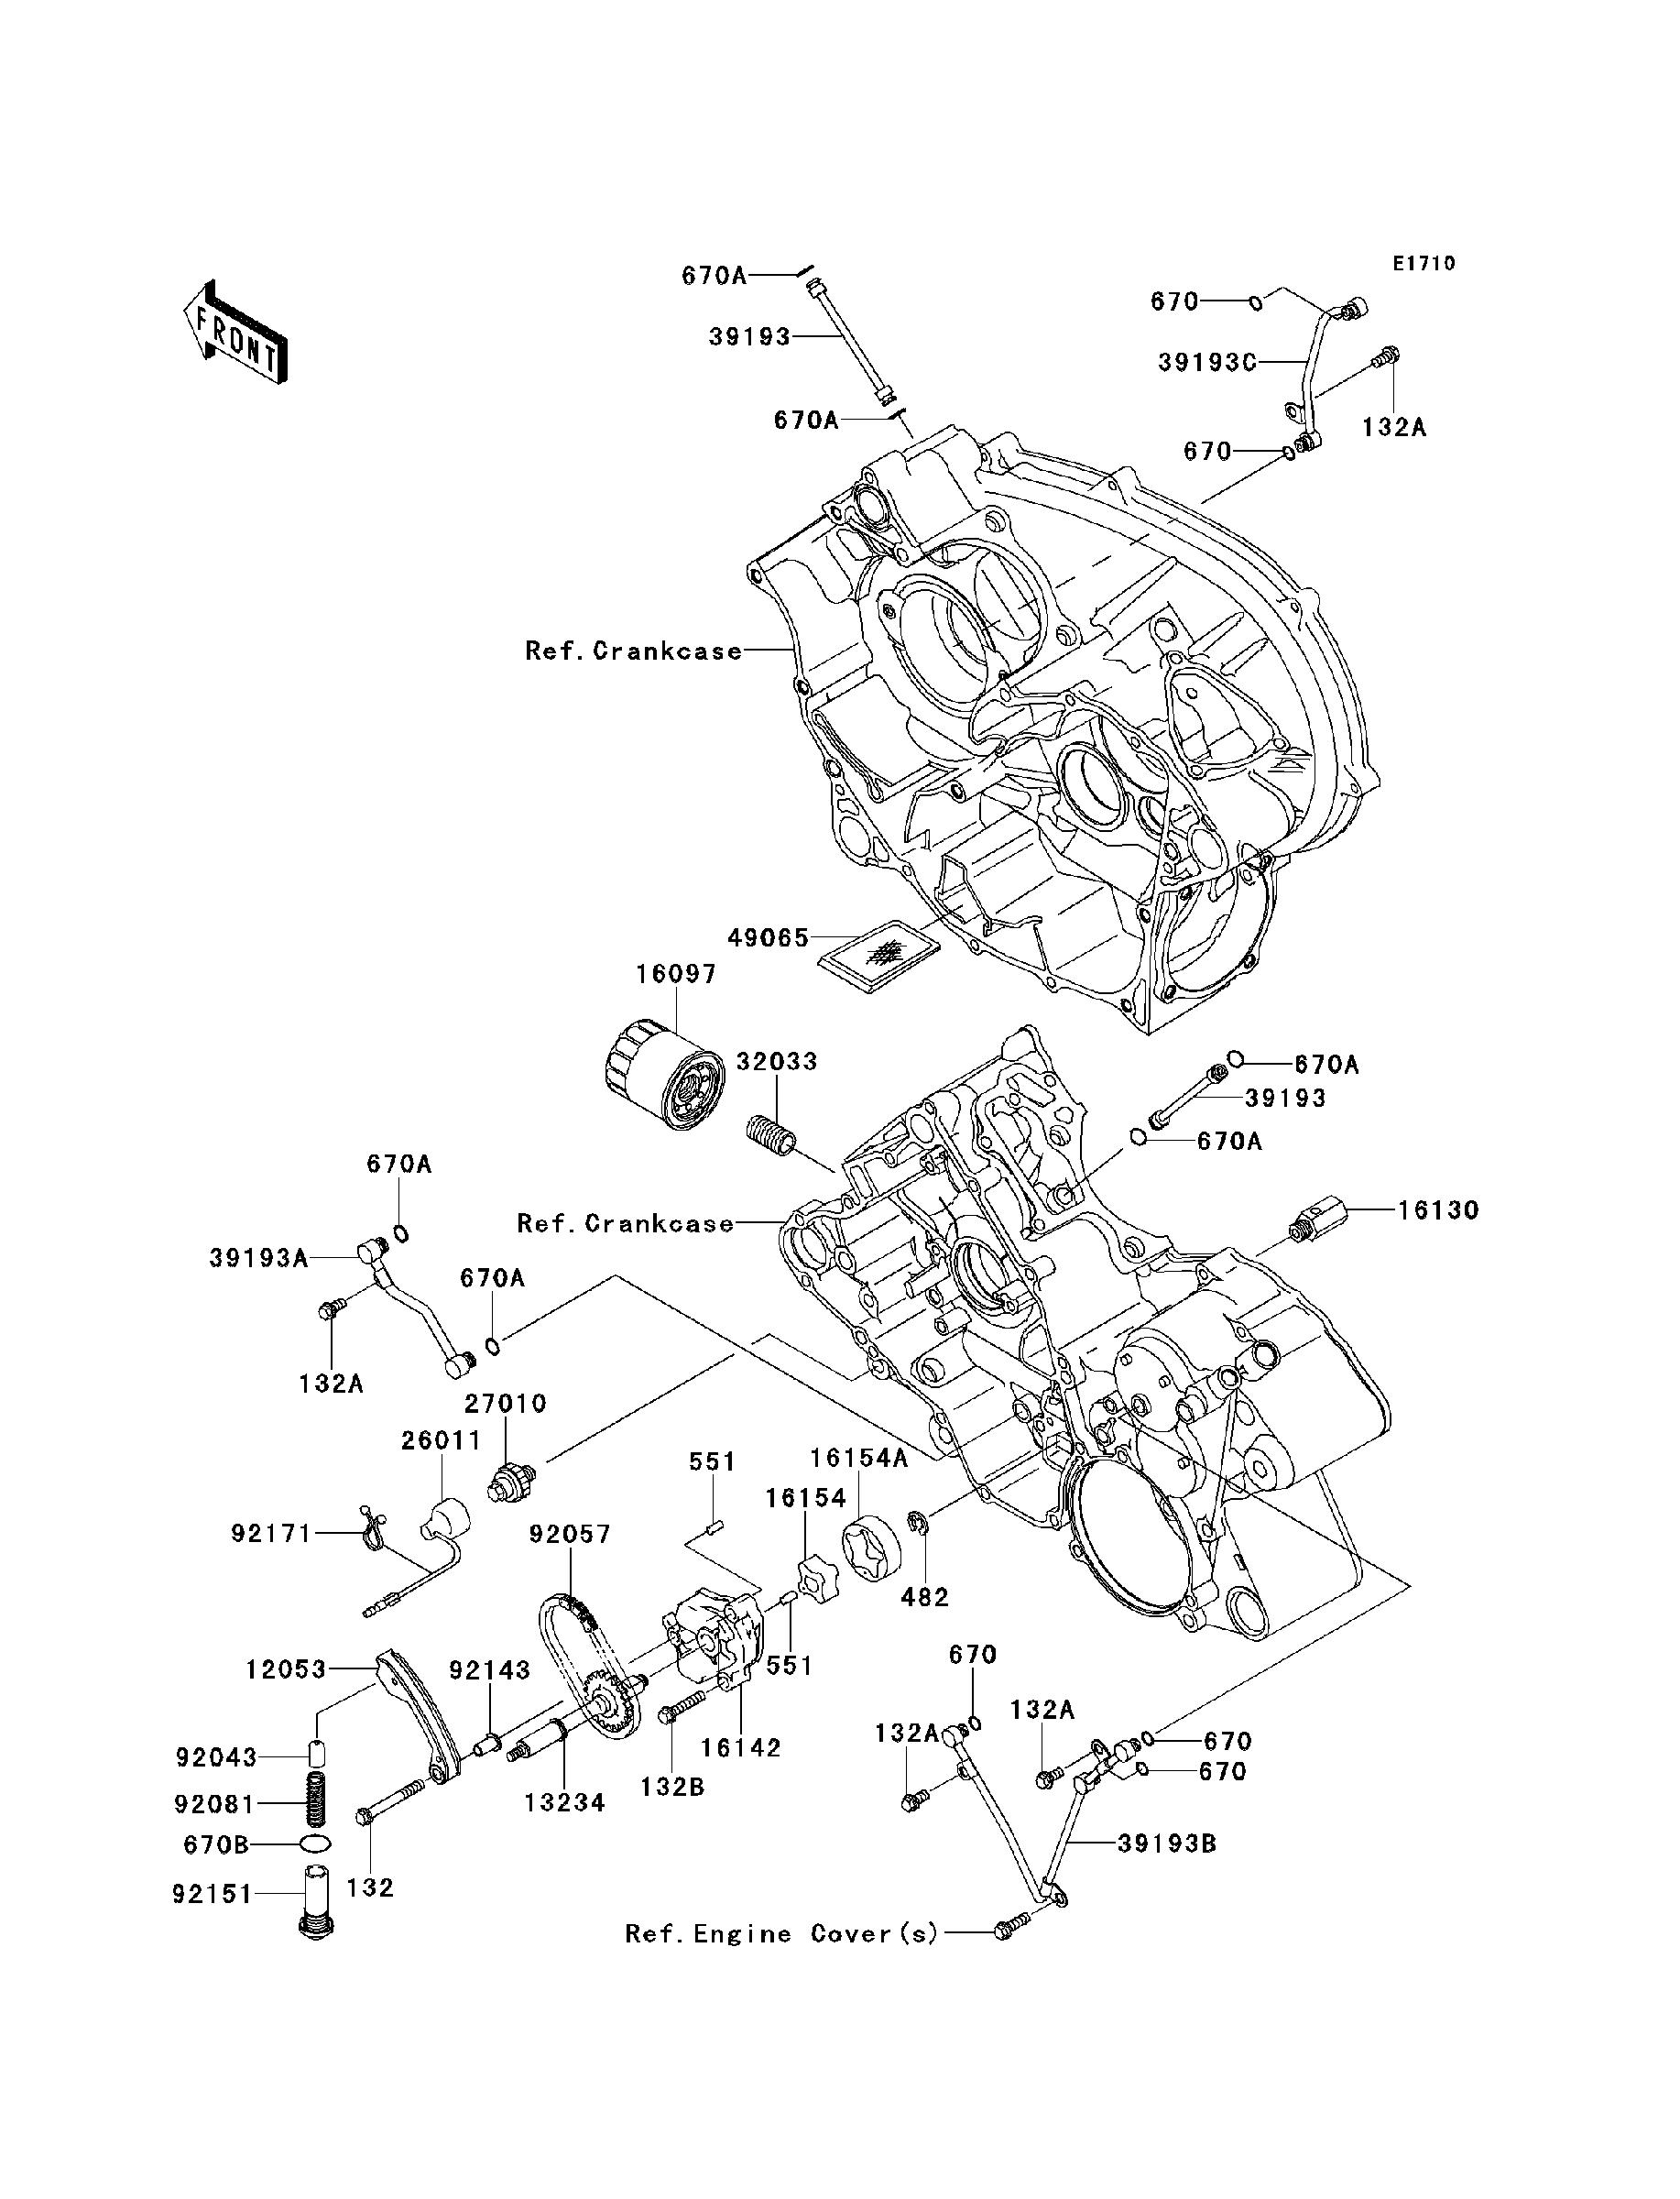 [SCHEMATICS_43NM]  FK_6493] Teryx Wiring Diagram Download Diagram | 2015 Kawasaki Teryx Wiring Schematic |  | Xortanet Cali Rious Over Wigeg Mohammedshrine Librar Wiring 101